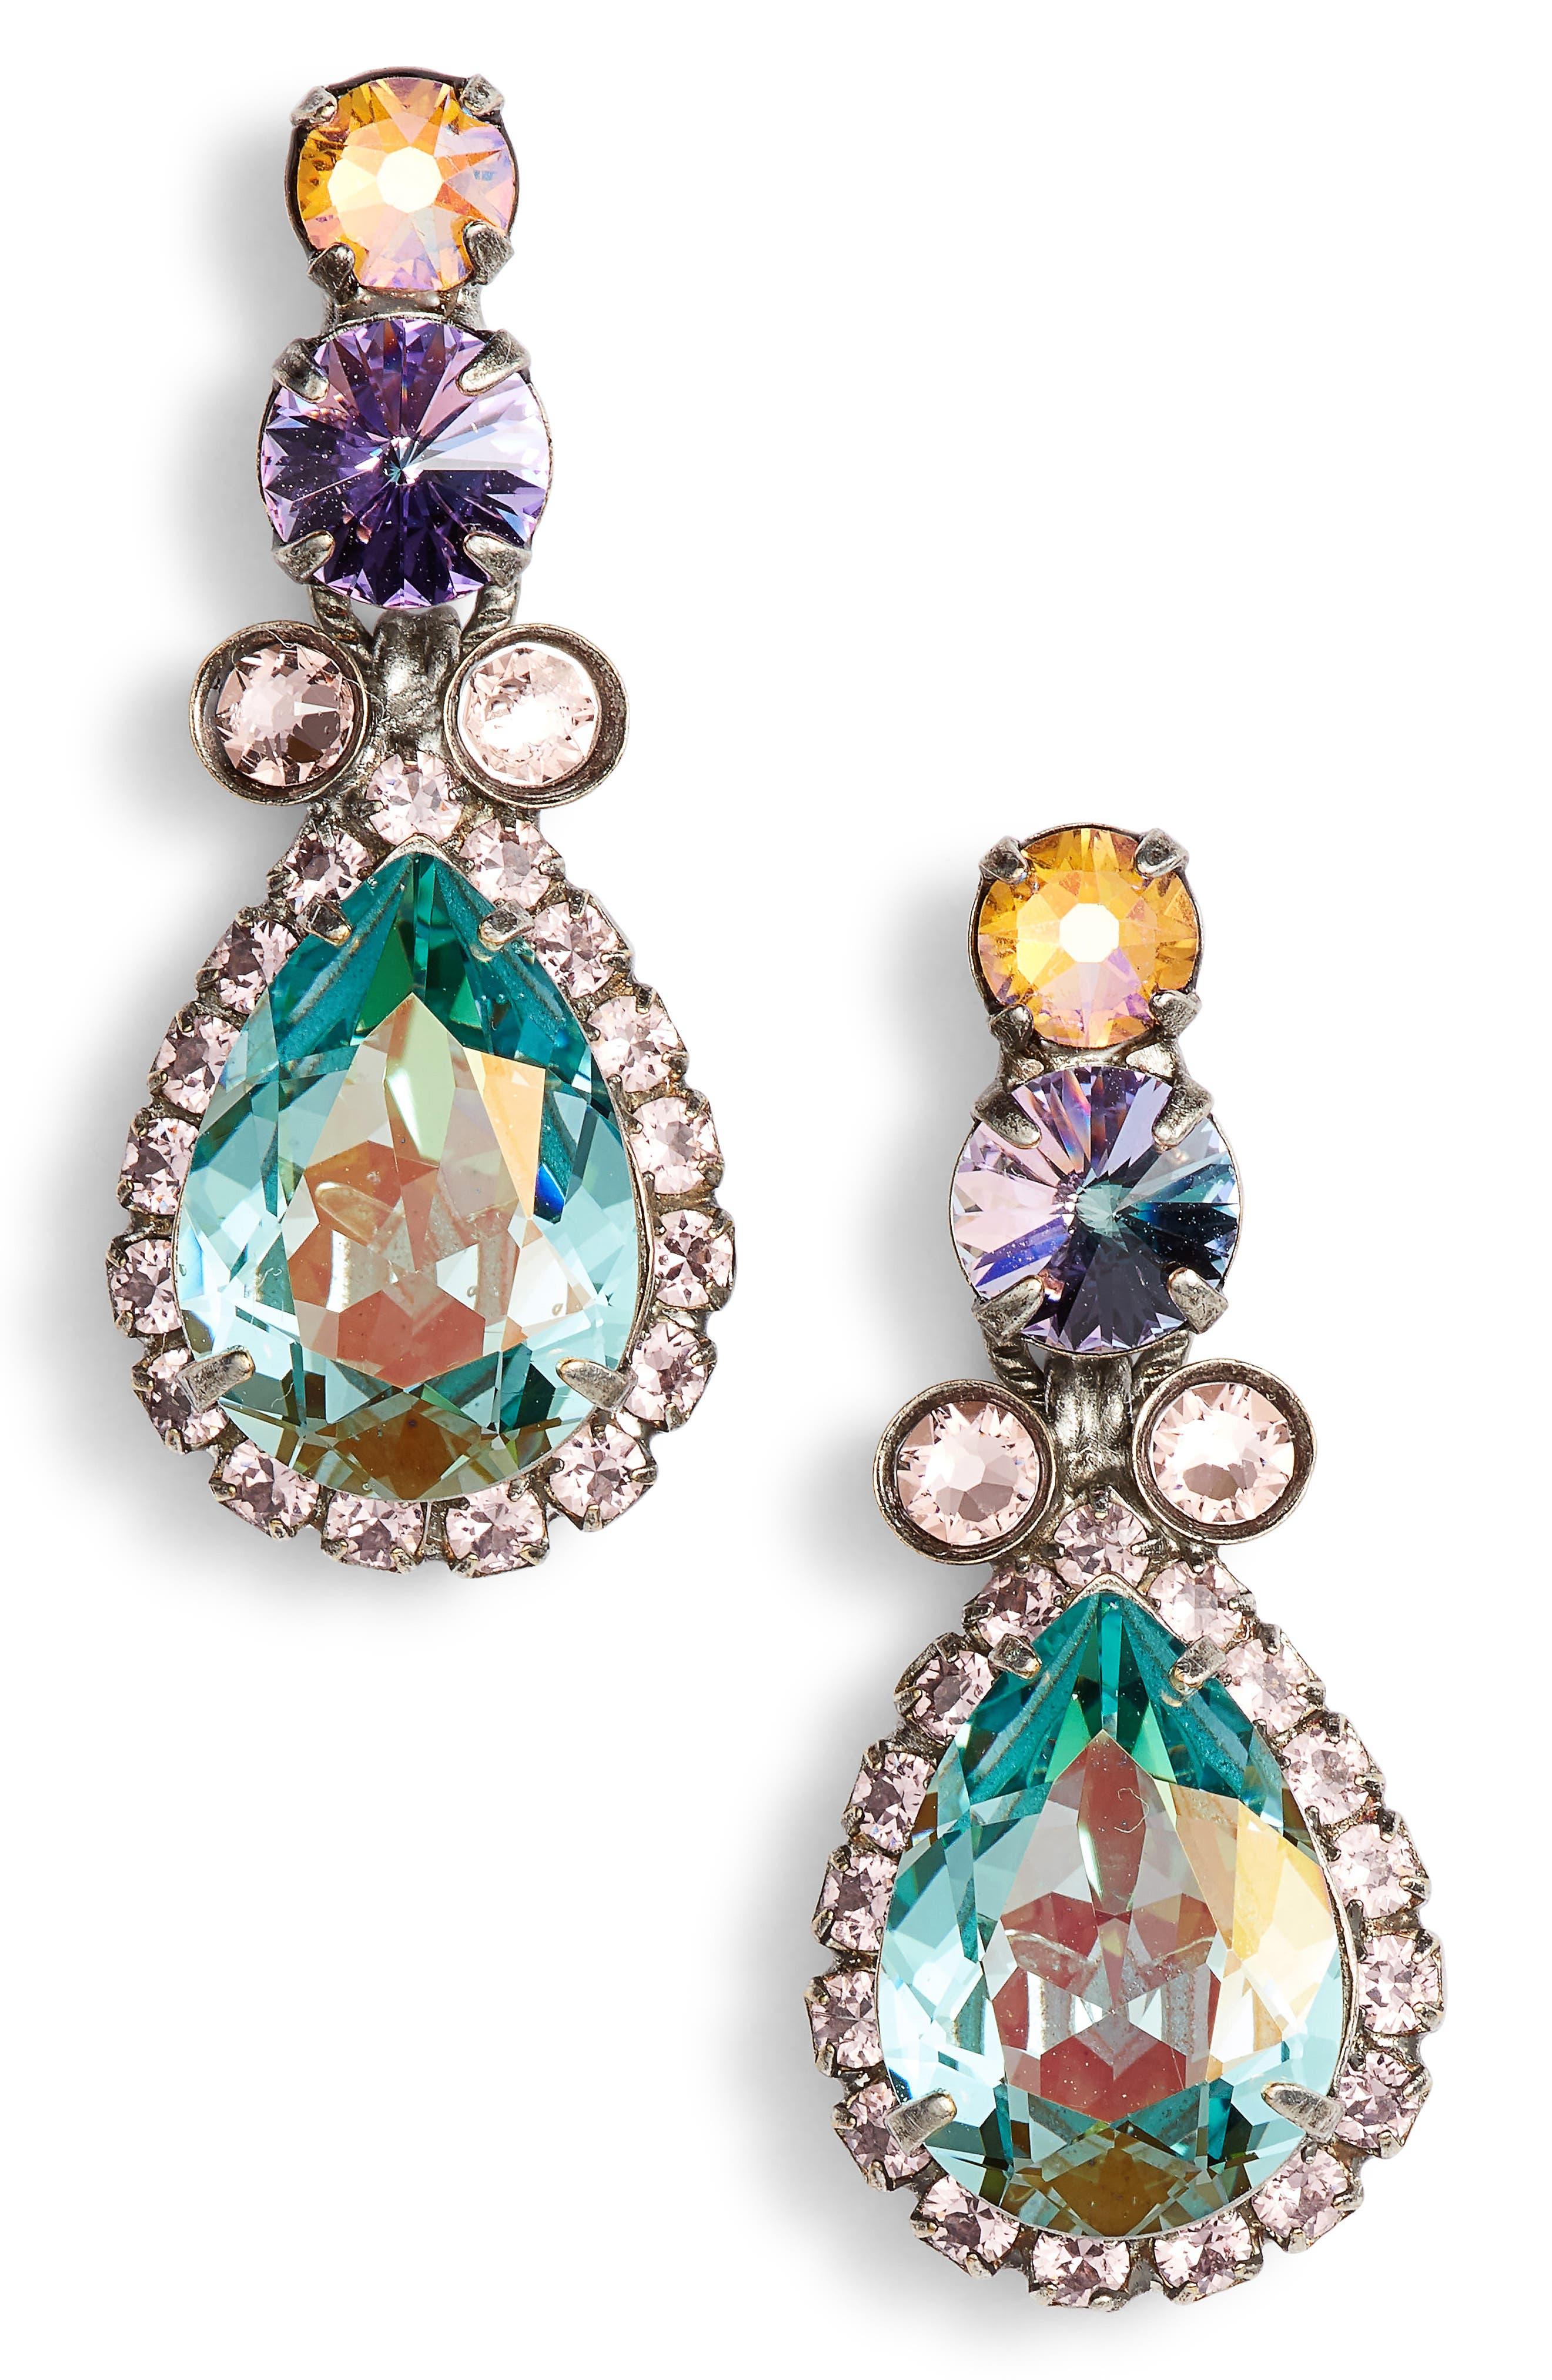 Brugmansia Crystal Drop Earrings,                             Main thumbnail 1, color,                             Blue/ Purple